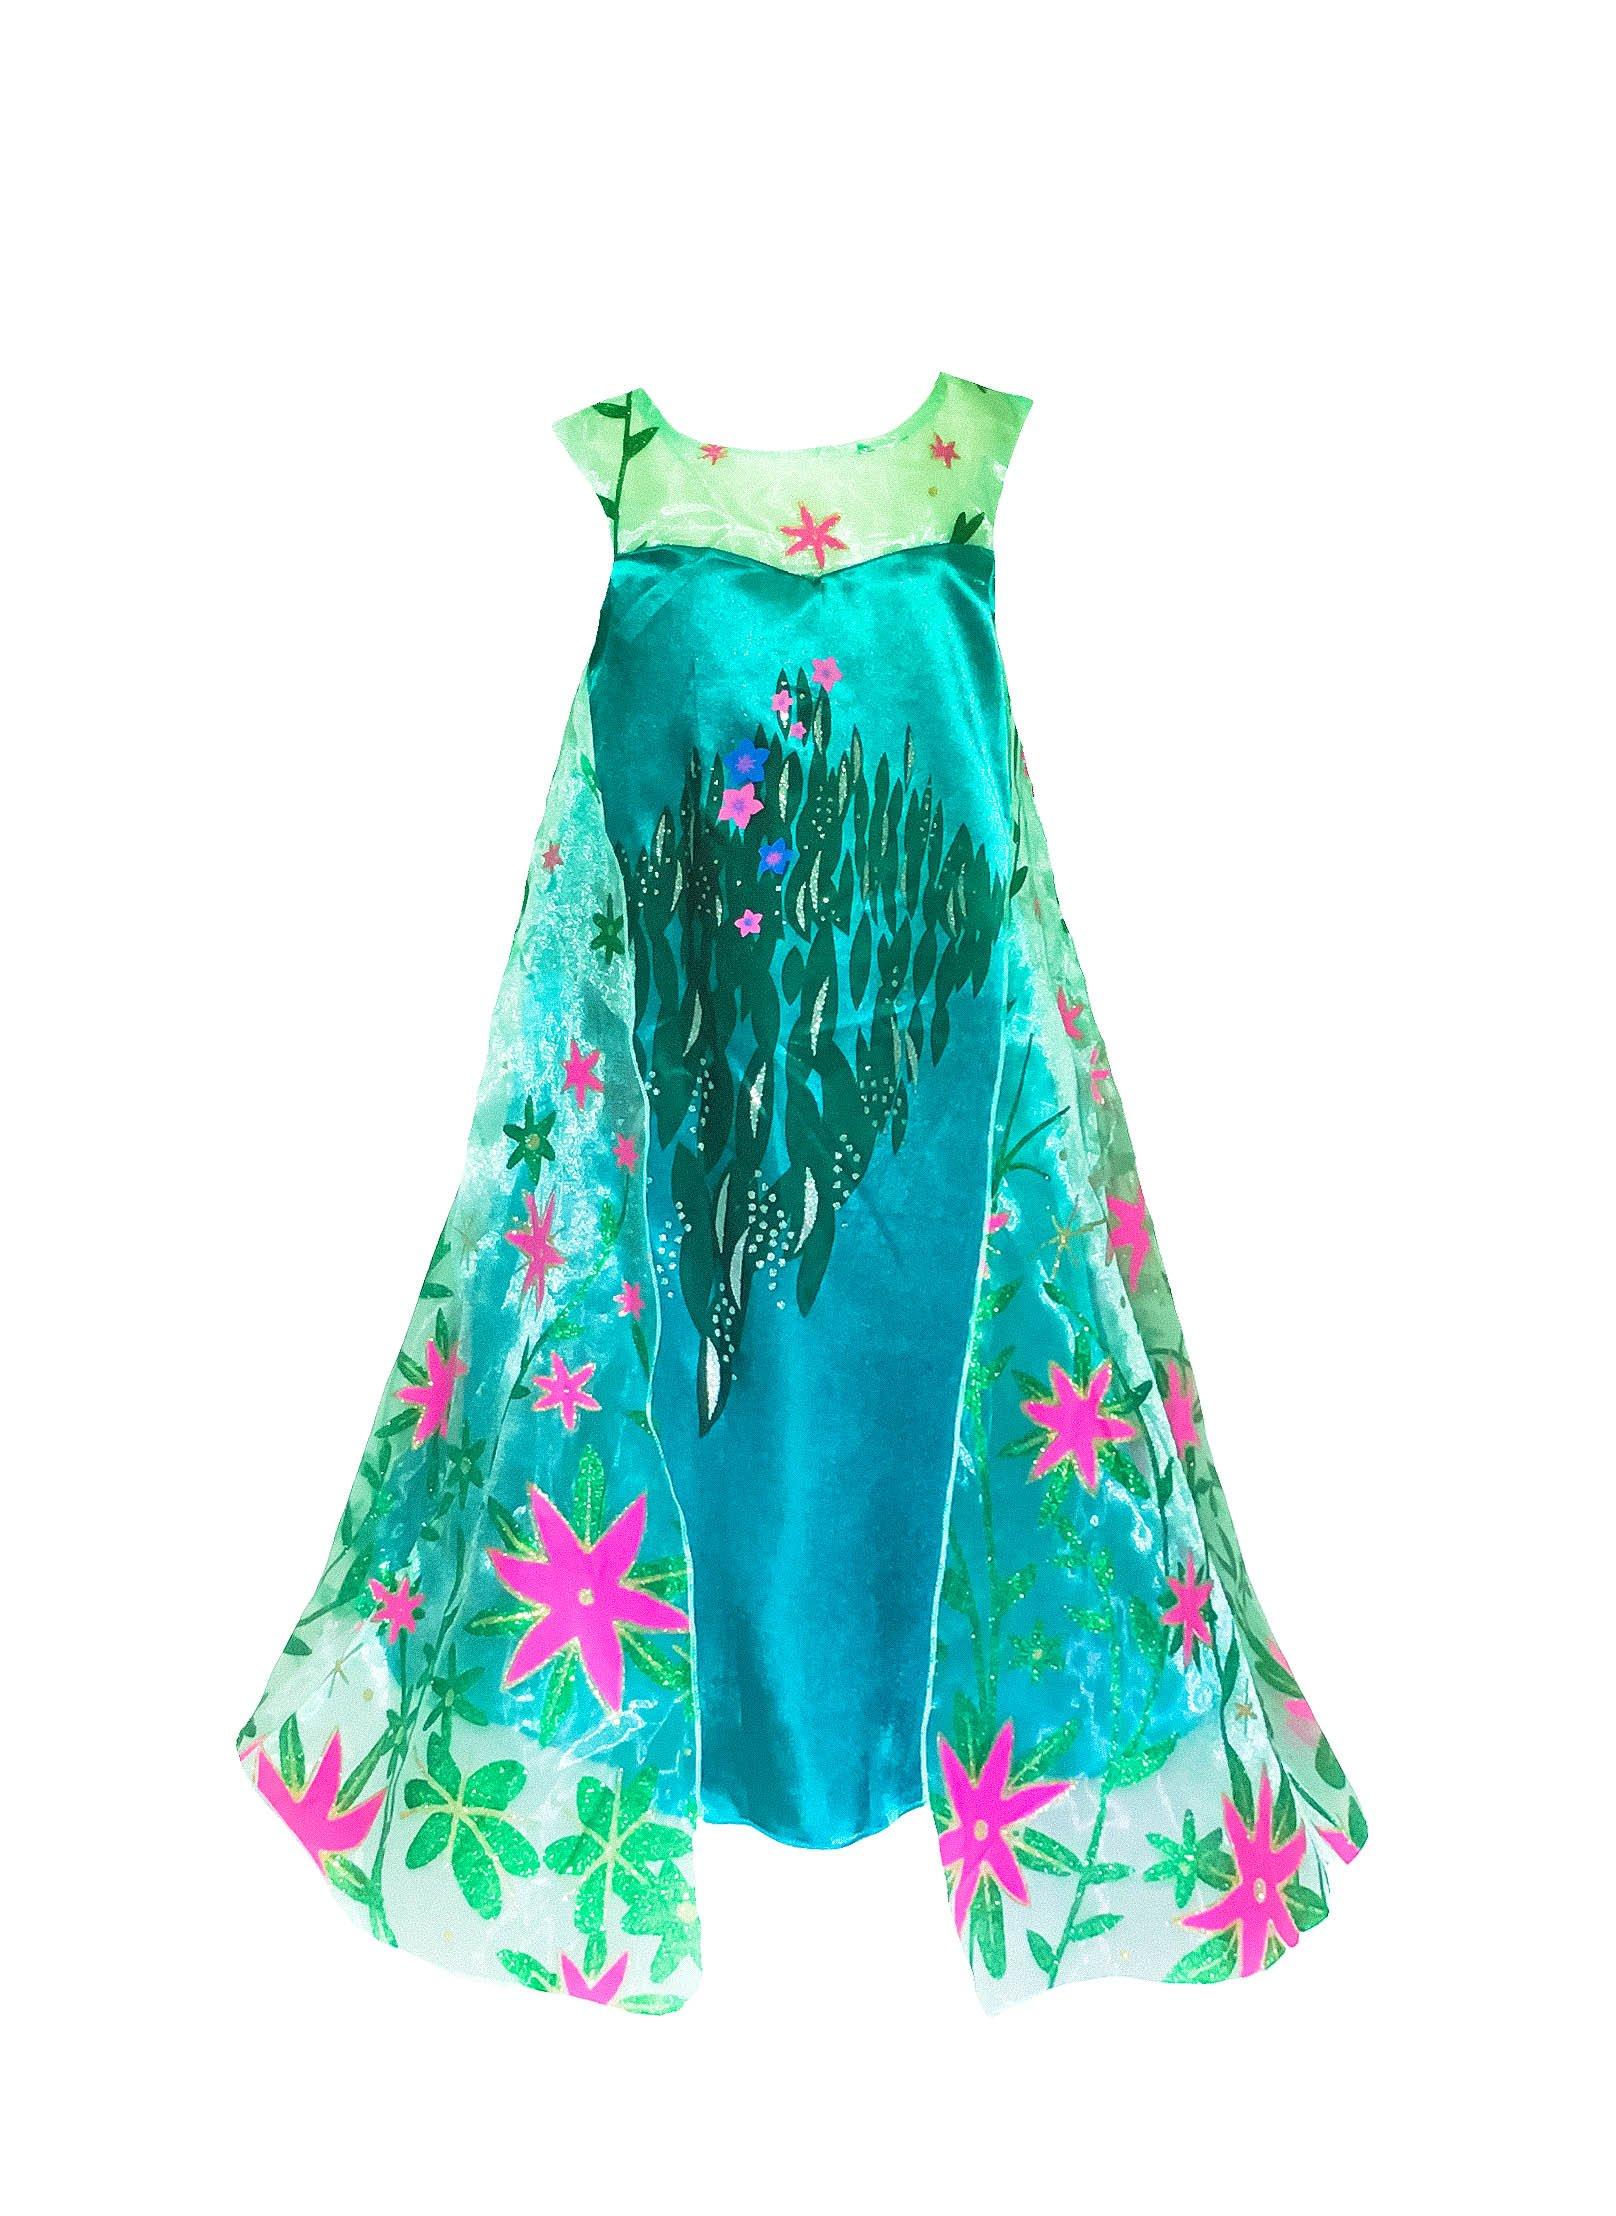 American Vogue Anna ELSA Frozen Fever Girl's Birthday Dress Costume (6-7 Years, Teal)